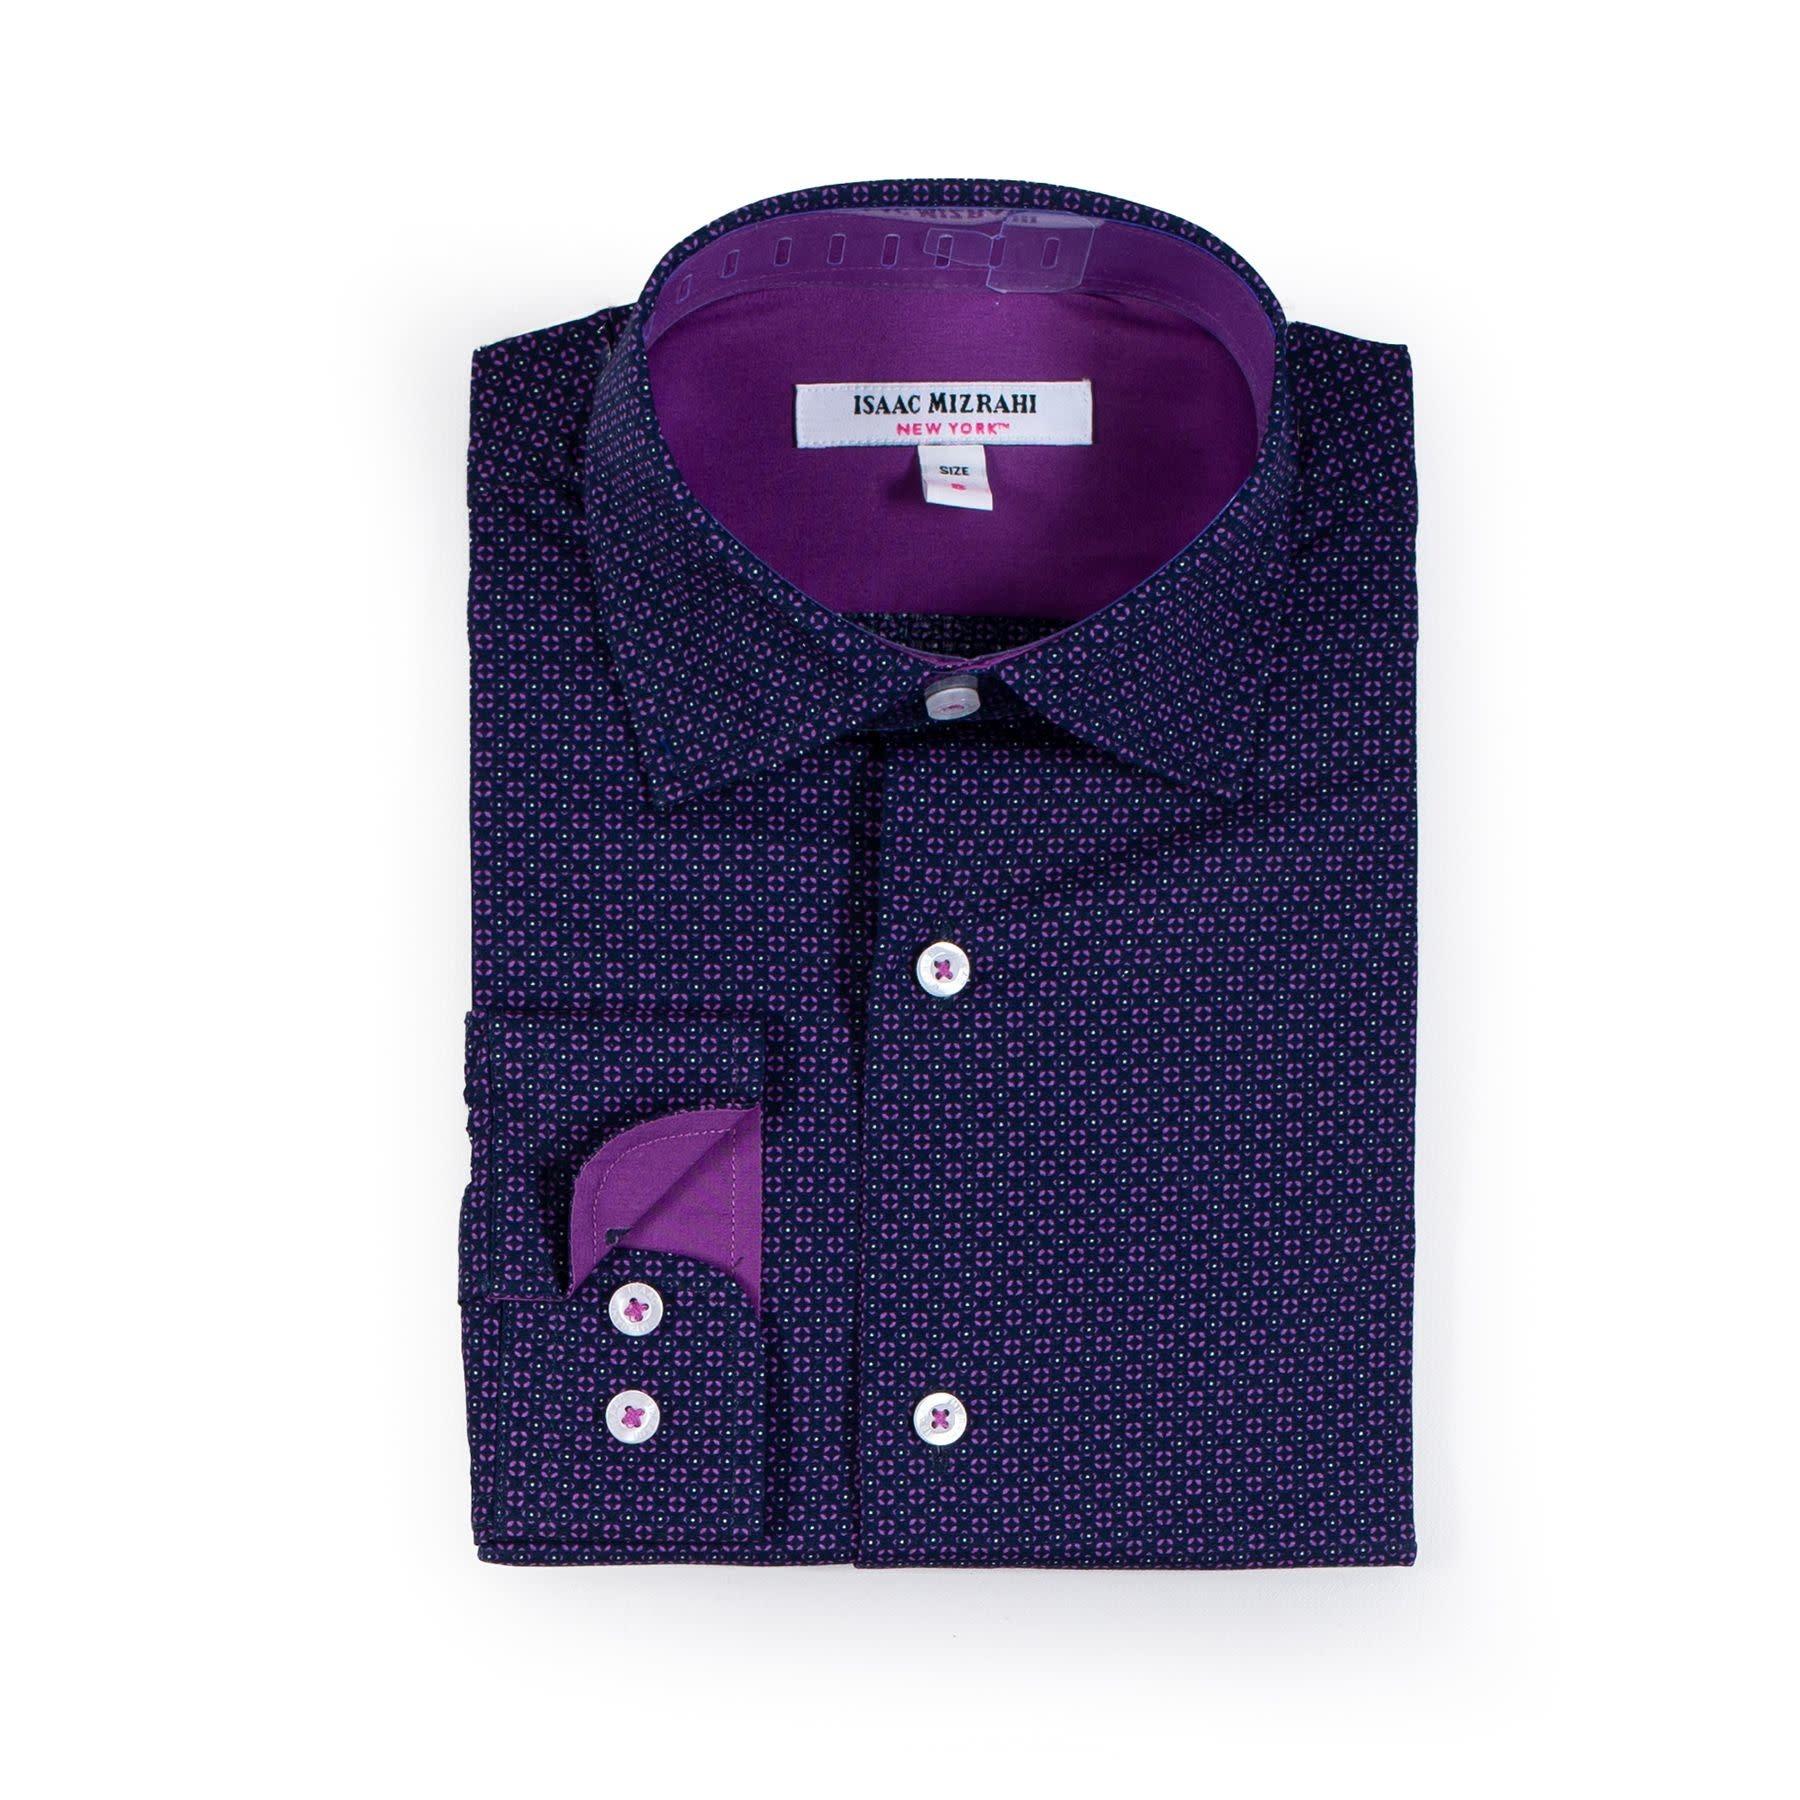 Boys Dress Shirt - Plum with Purple Emblem